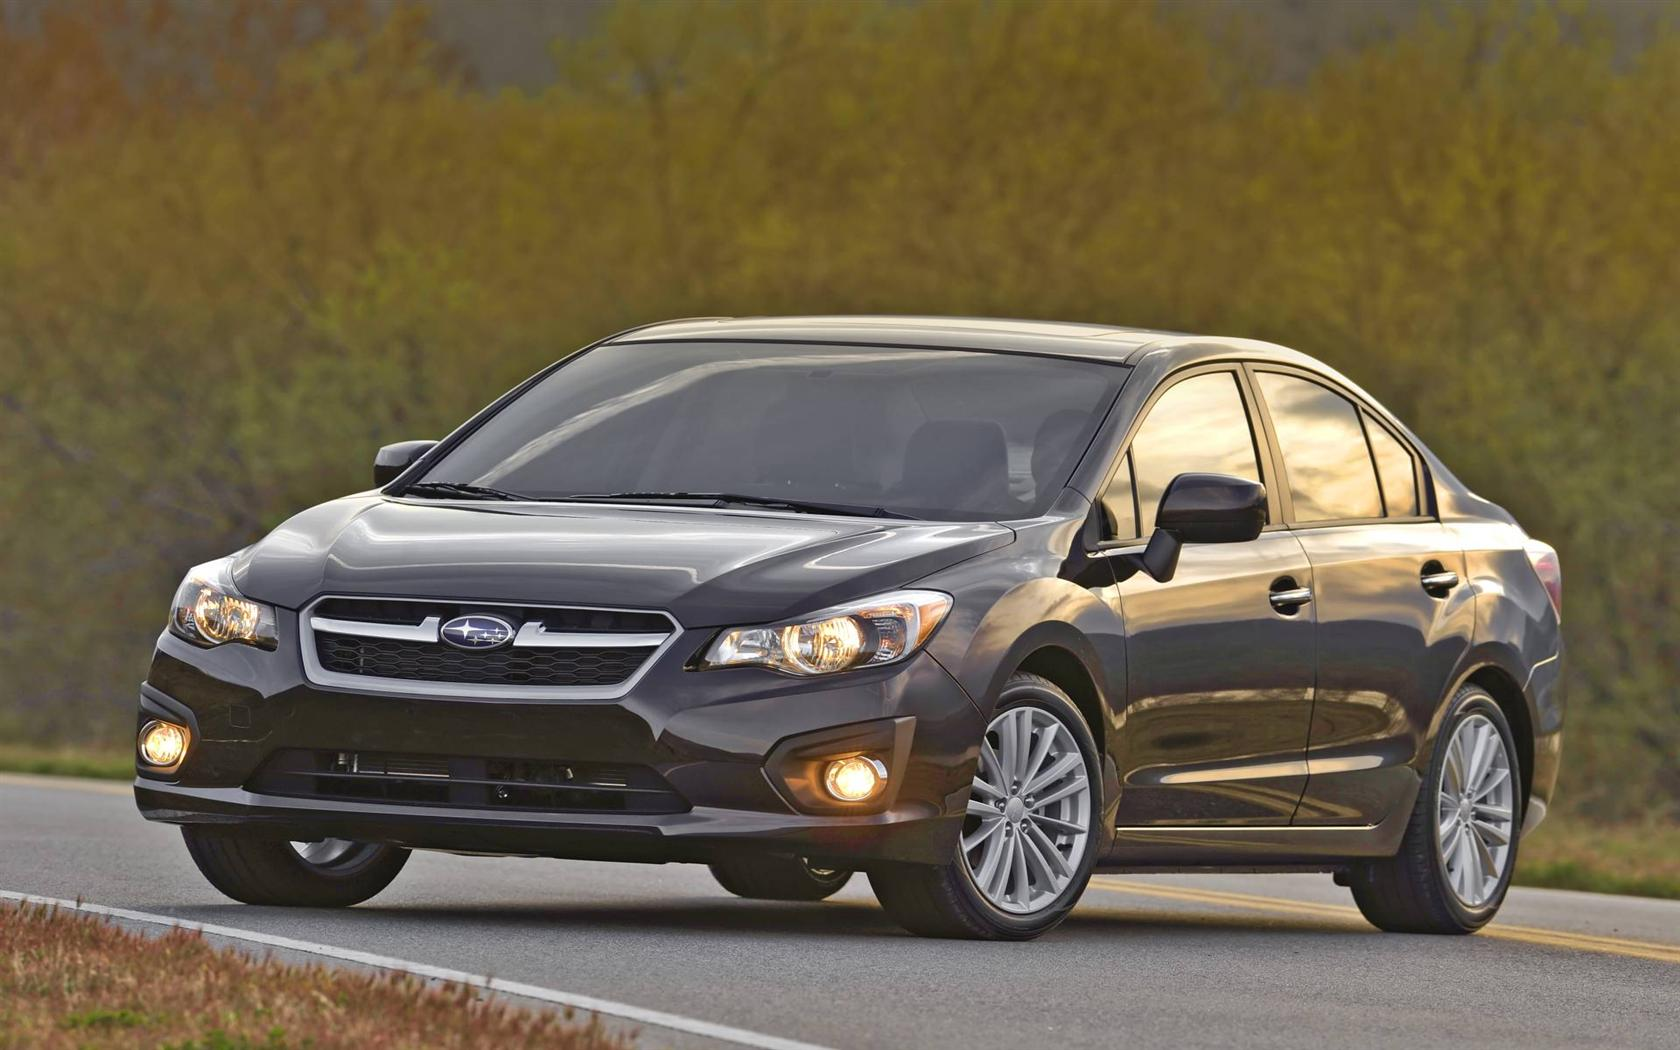 2013 Subaru Impreza Image 4